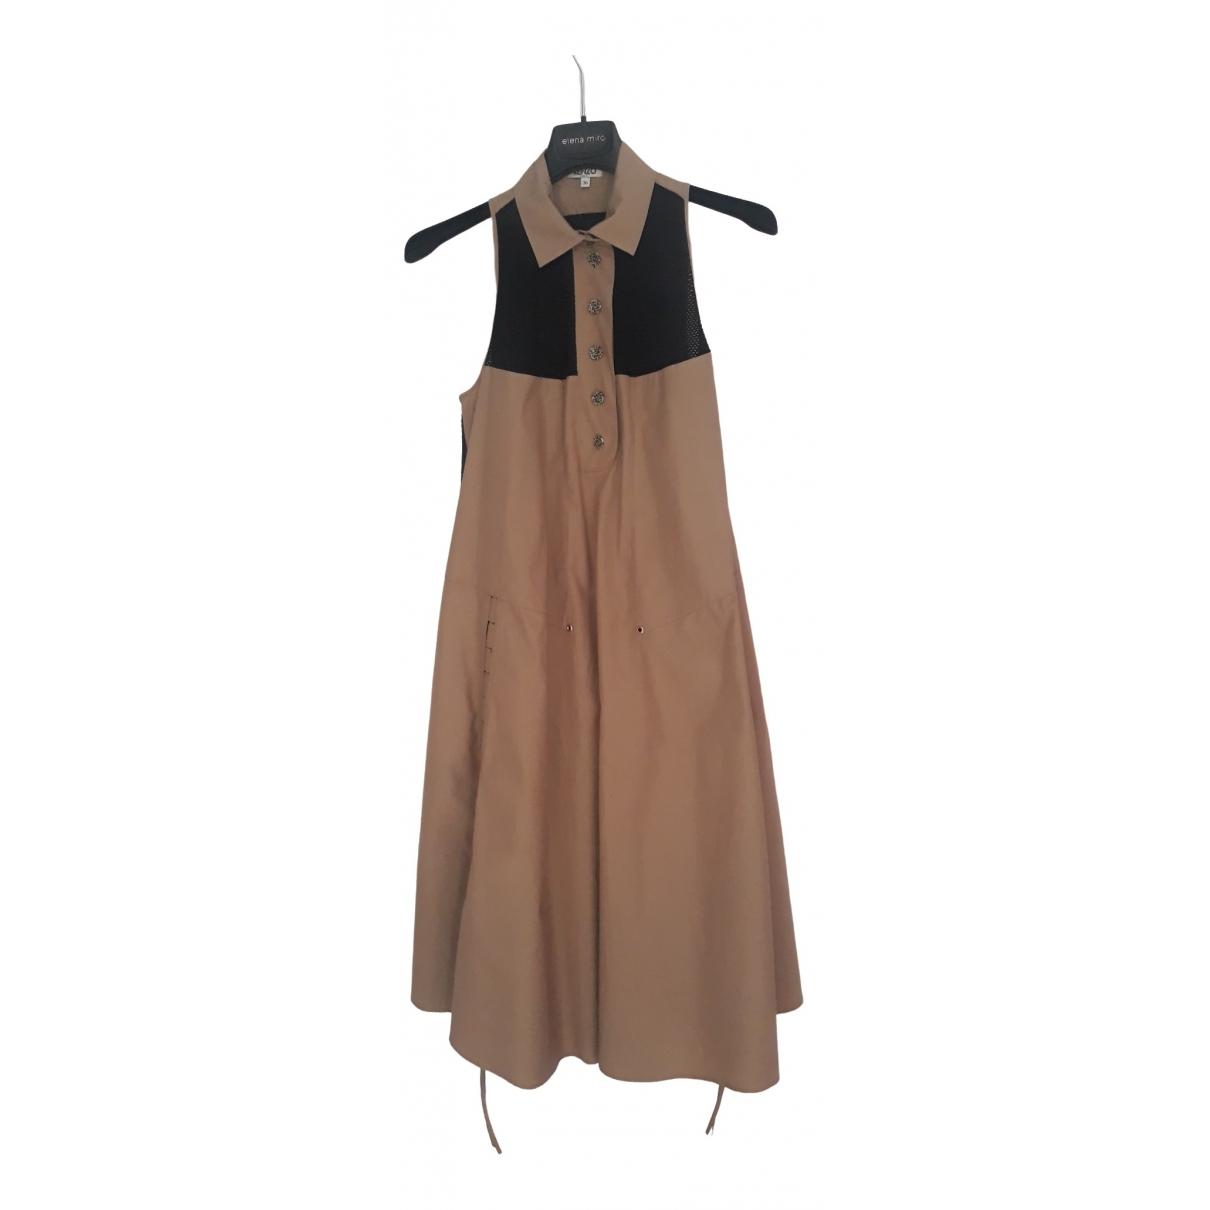 Kenzo \N Camel Cotton dress for Women 36 FR